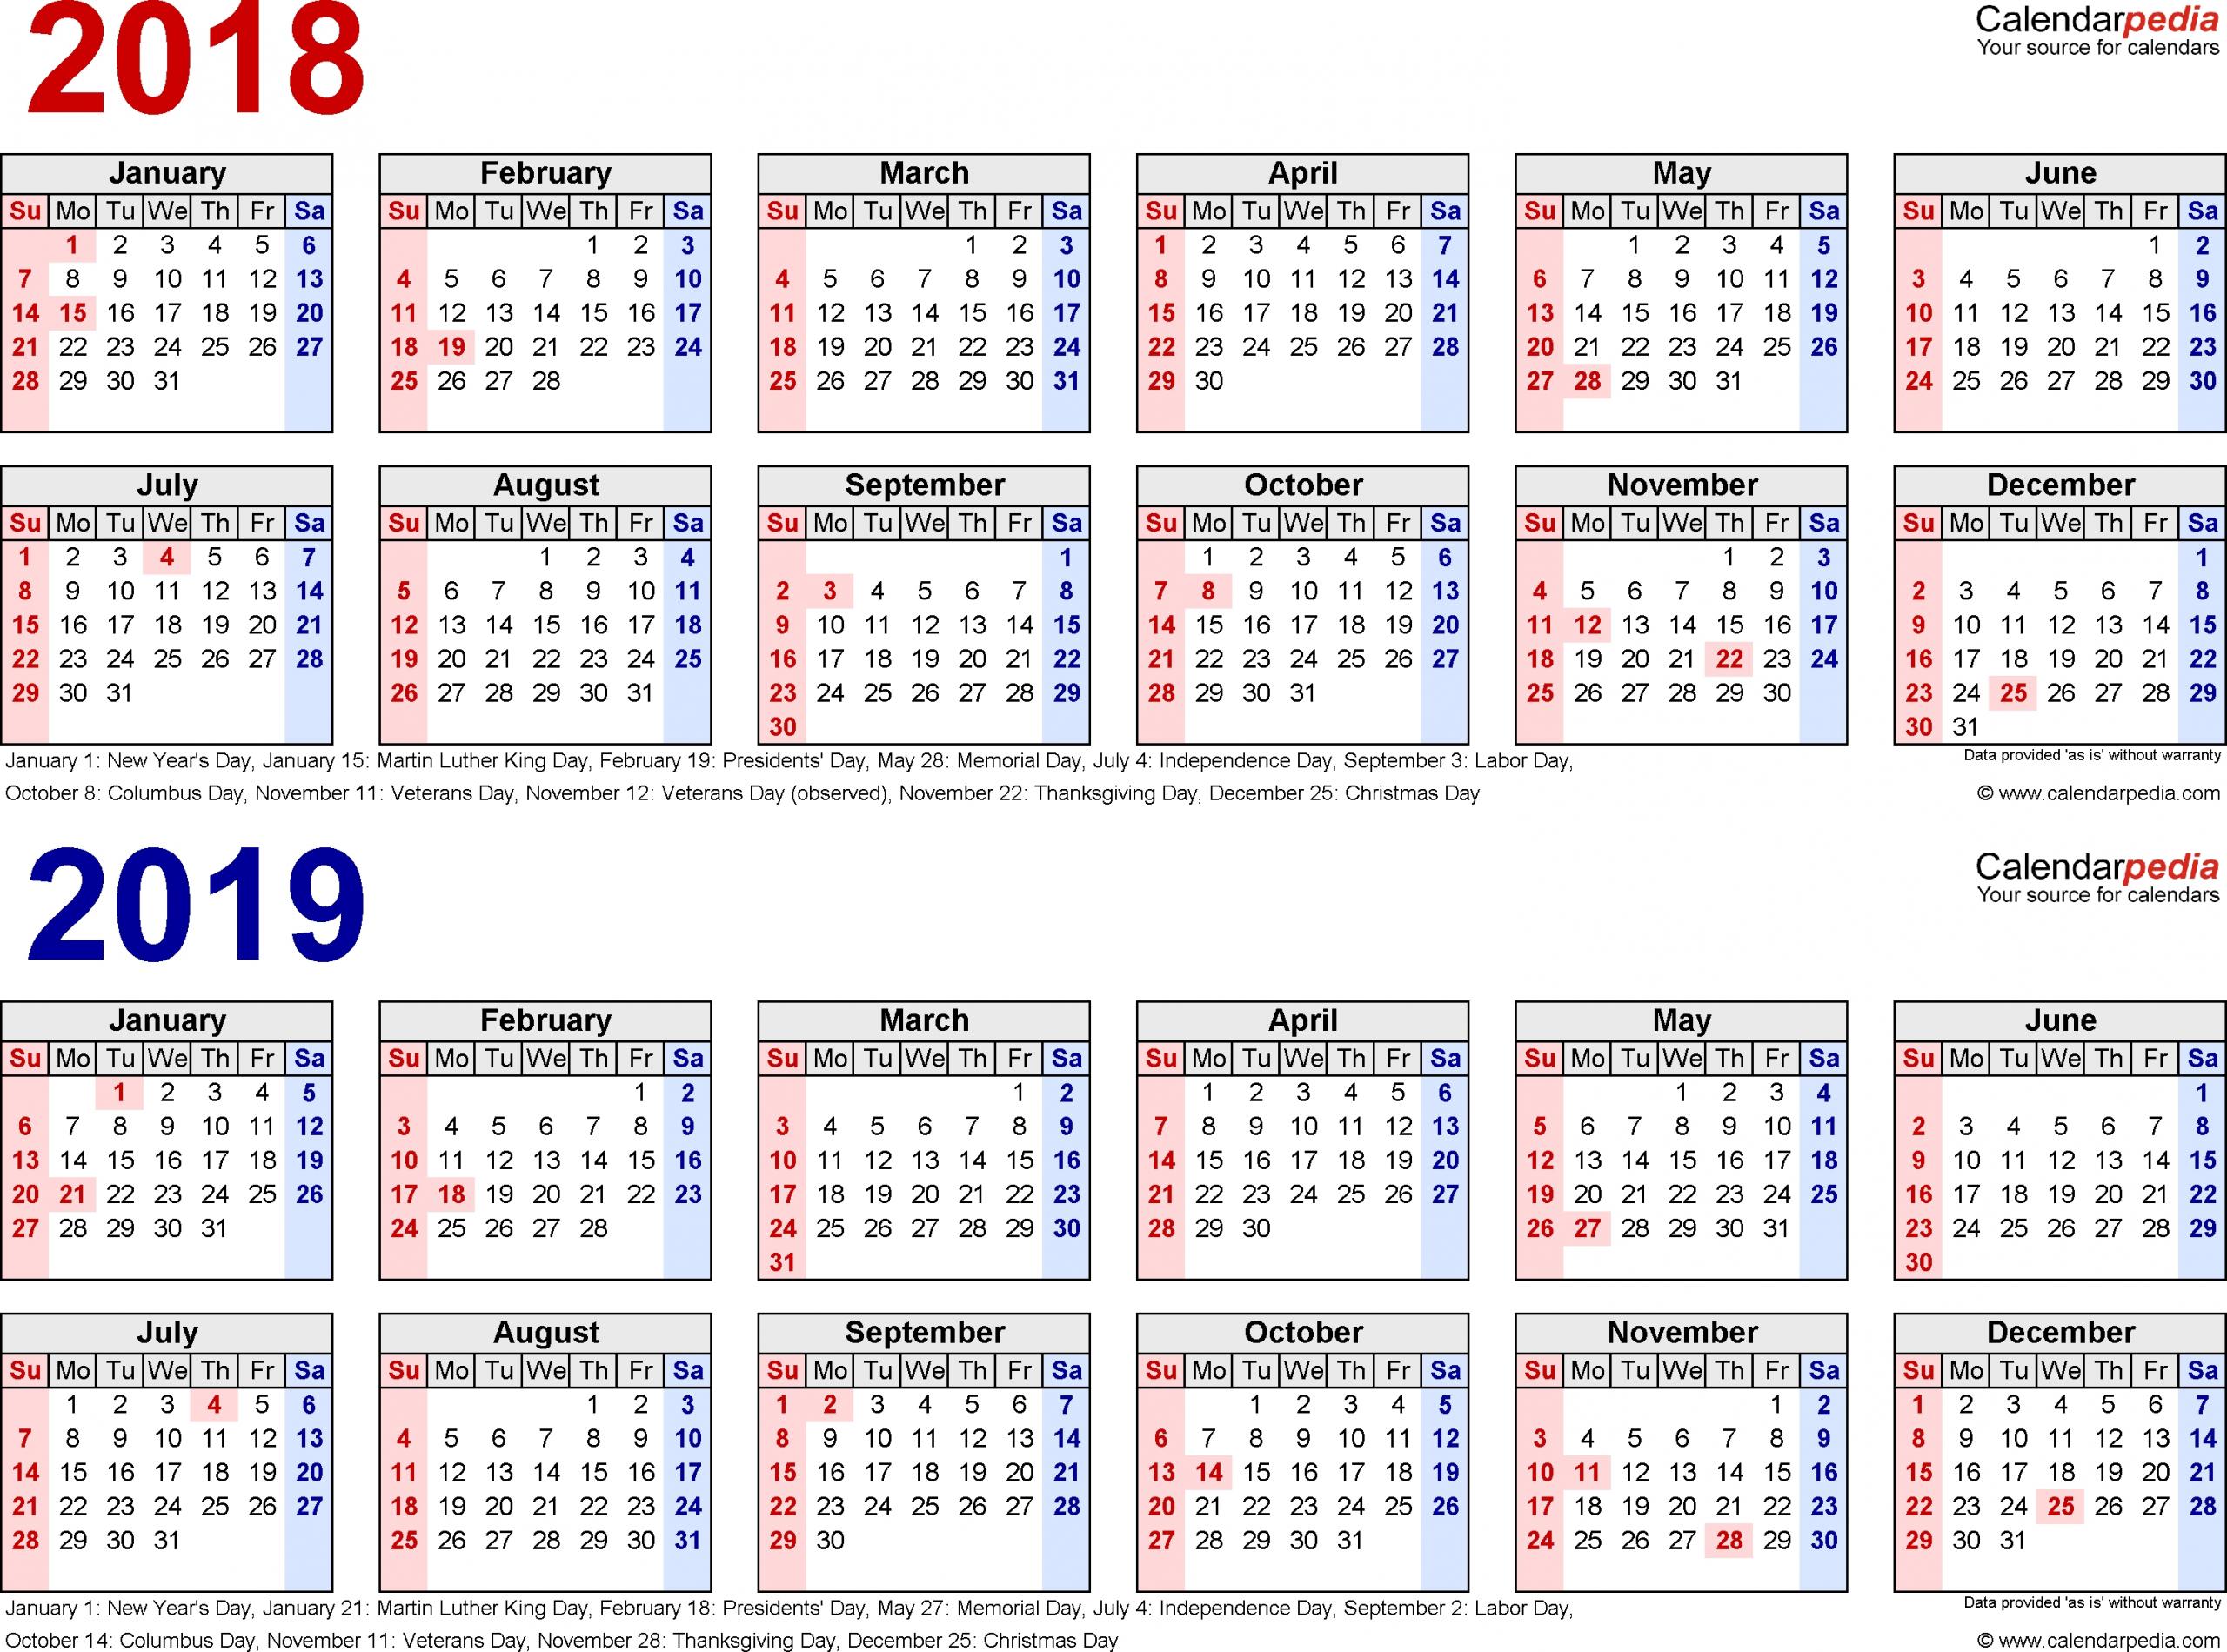 3 Year Calendar Printable 2018 2019 2020 - Calendar Multiple Year Printable Calendar